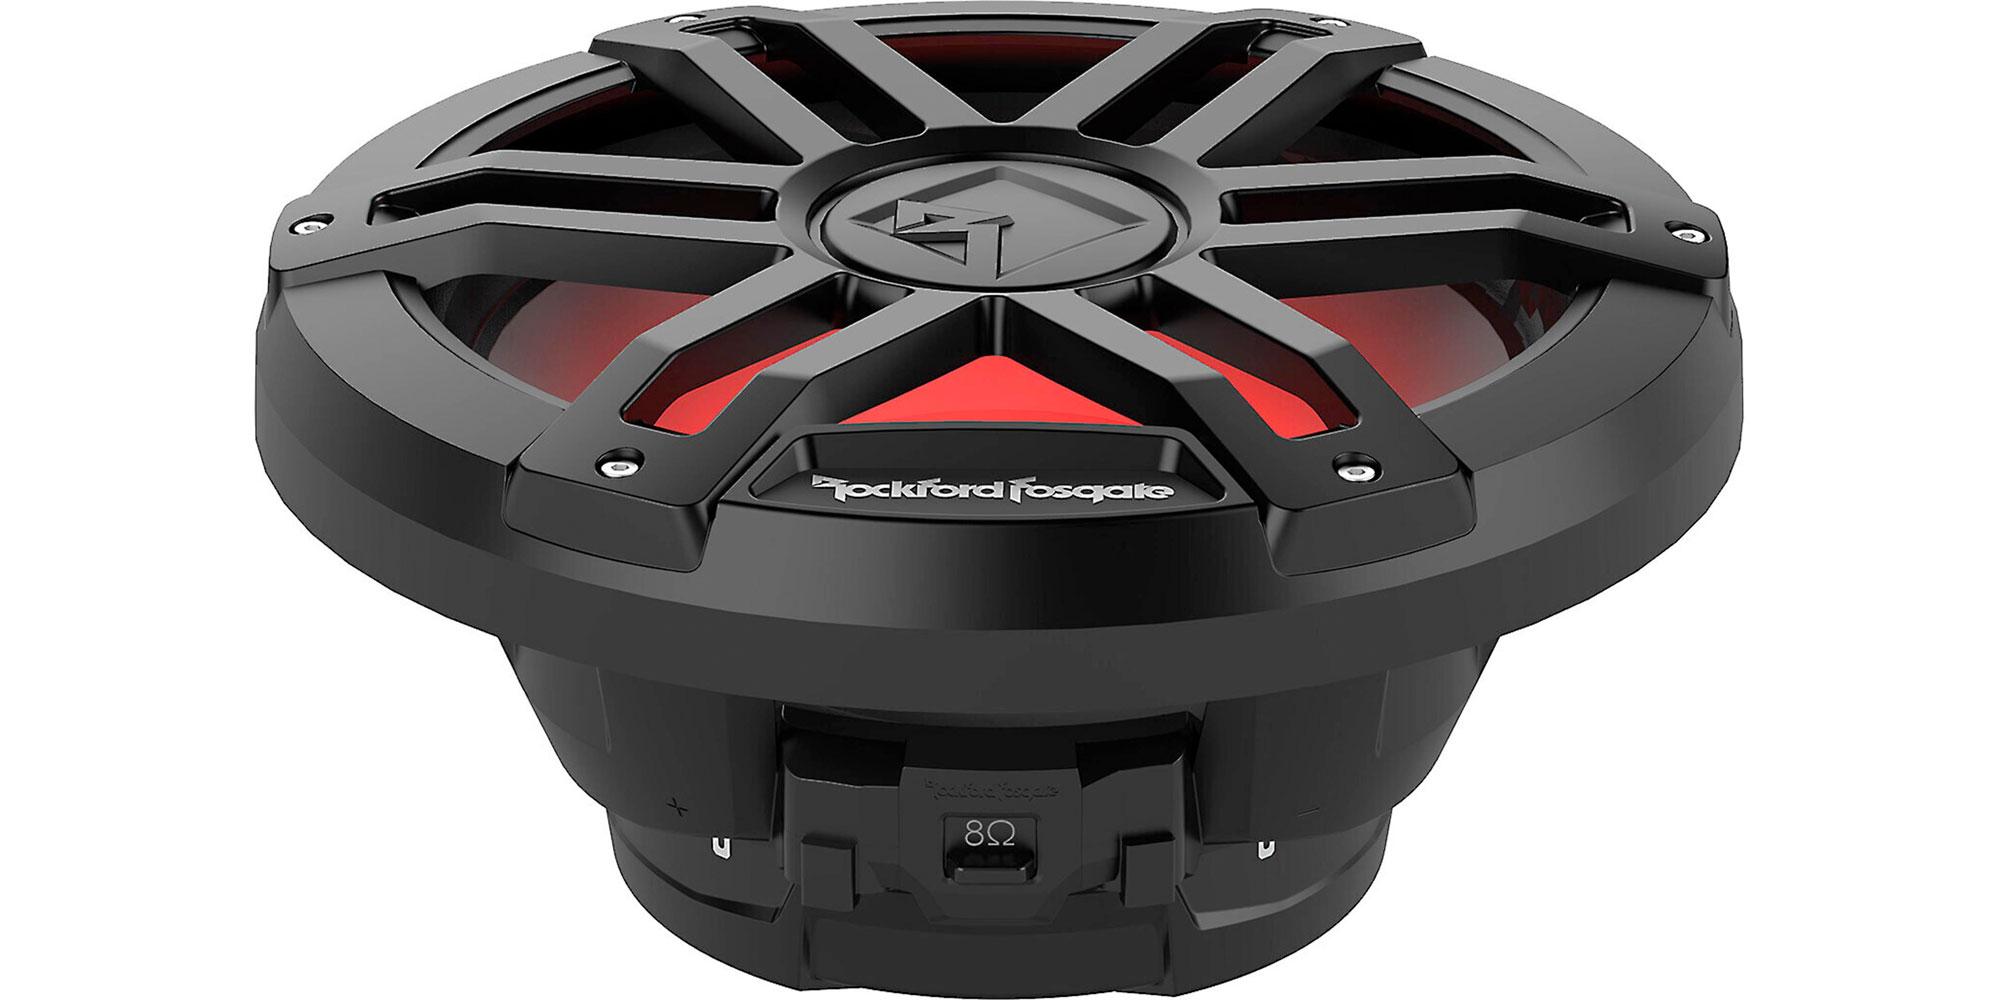 Rockford Fosgate RGB Speaker Subwoofer